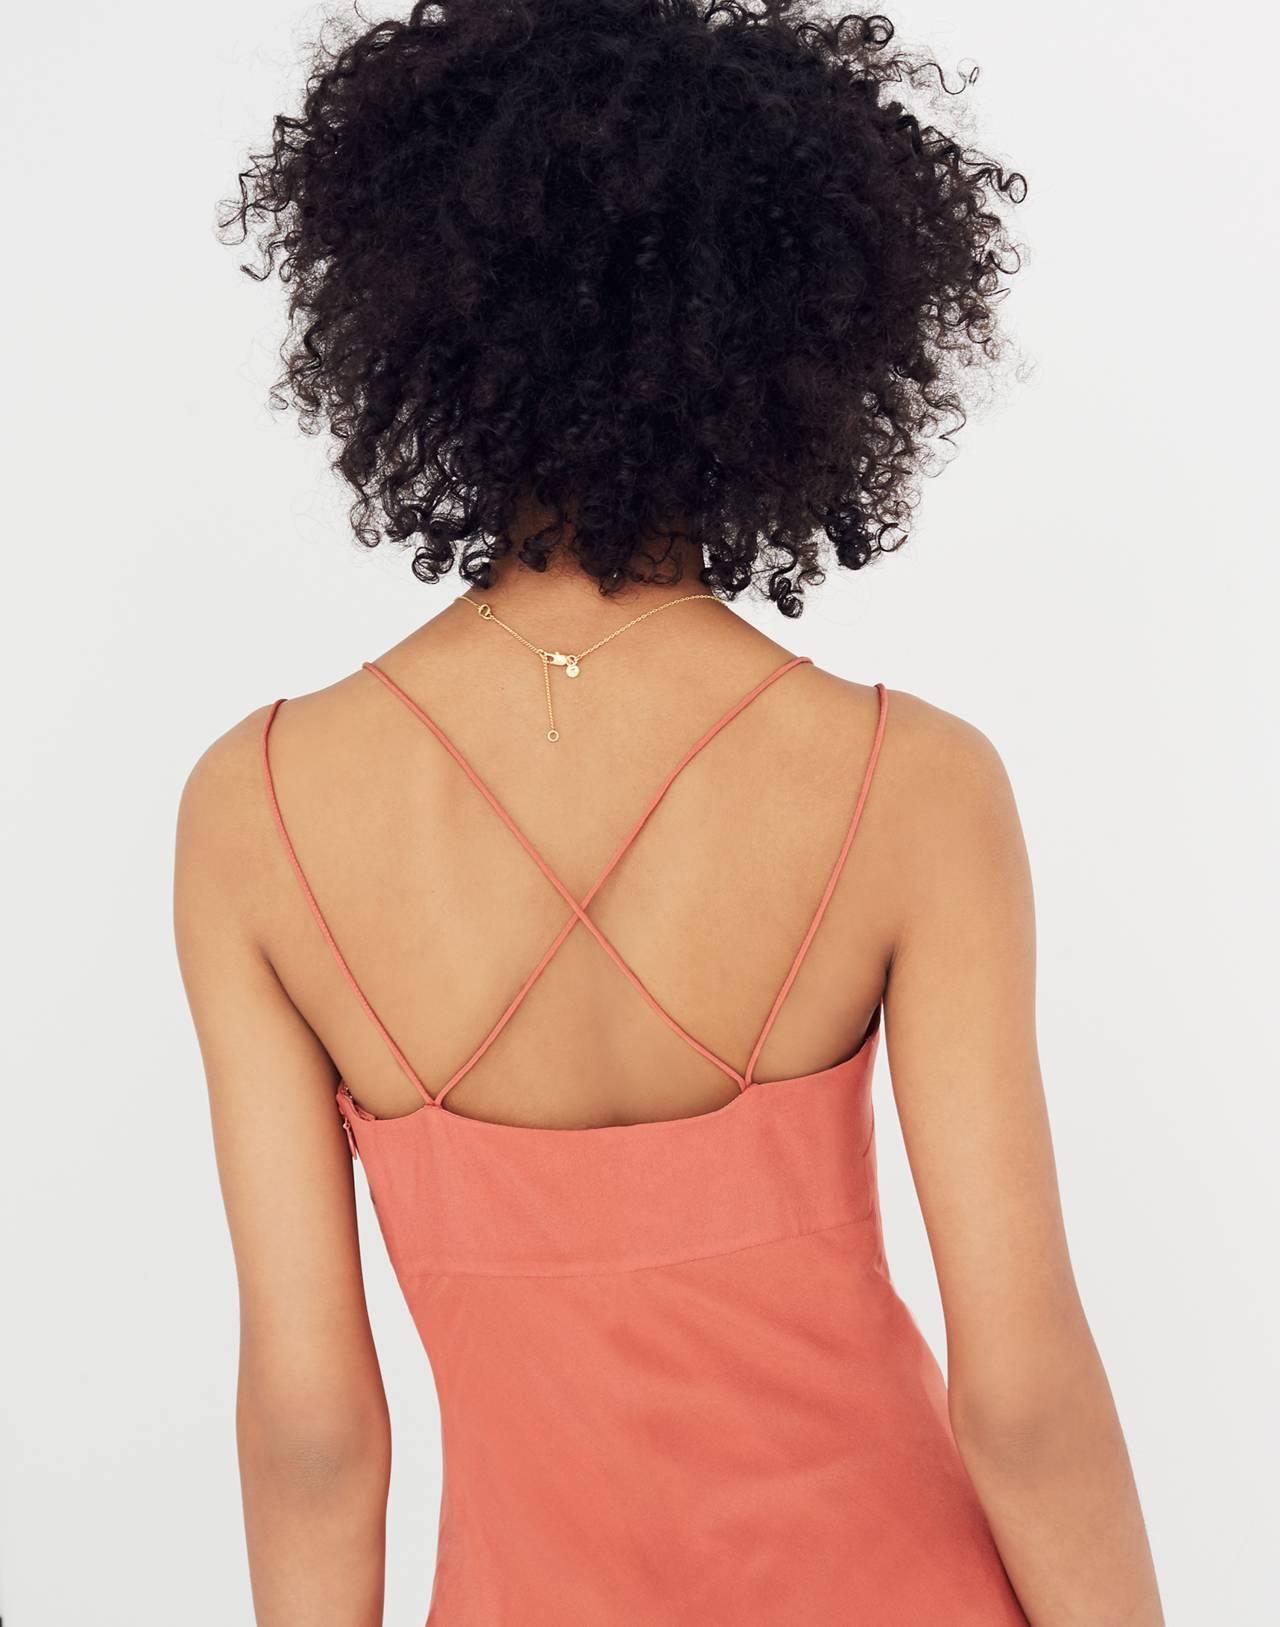 Silk Slip Dress in spiced rose image 2